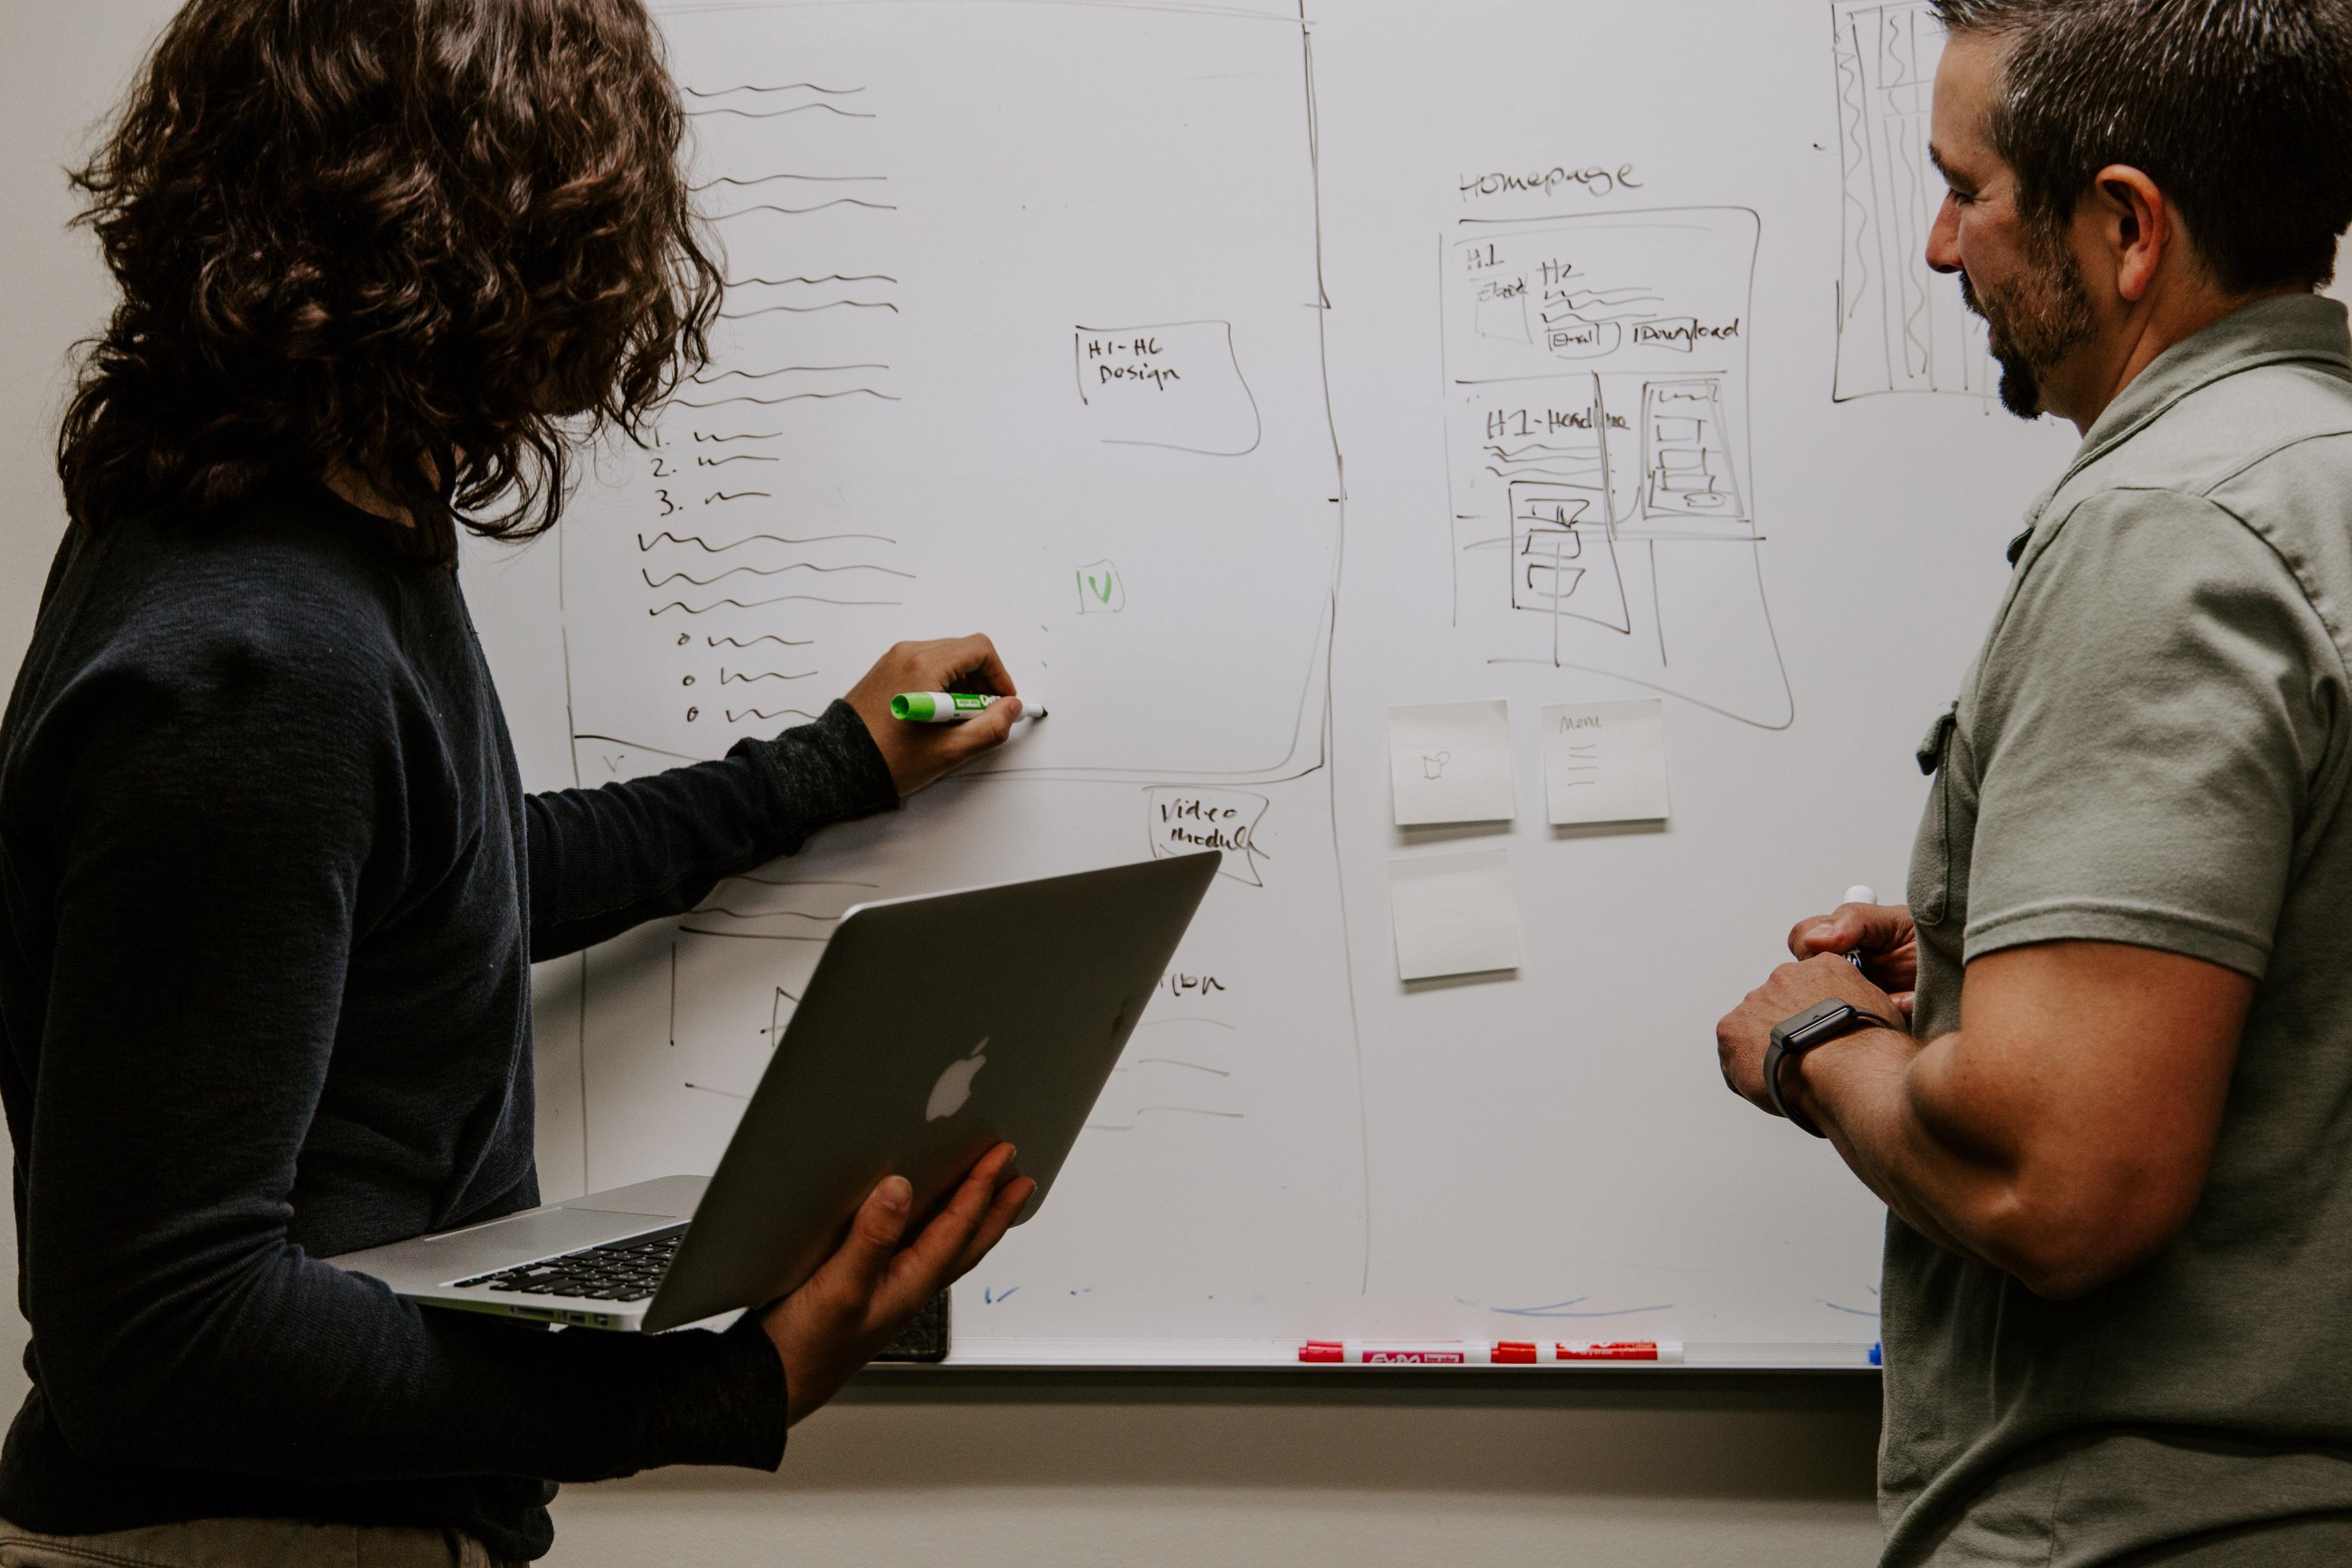 Brainstorming content for a presentation deck